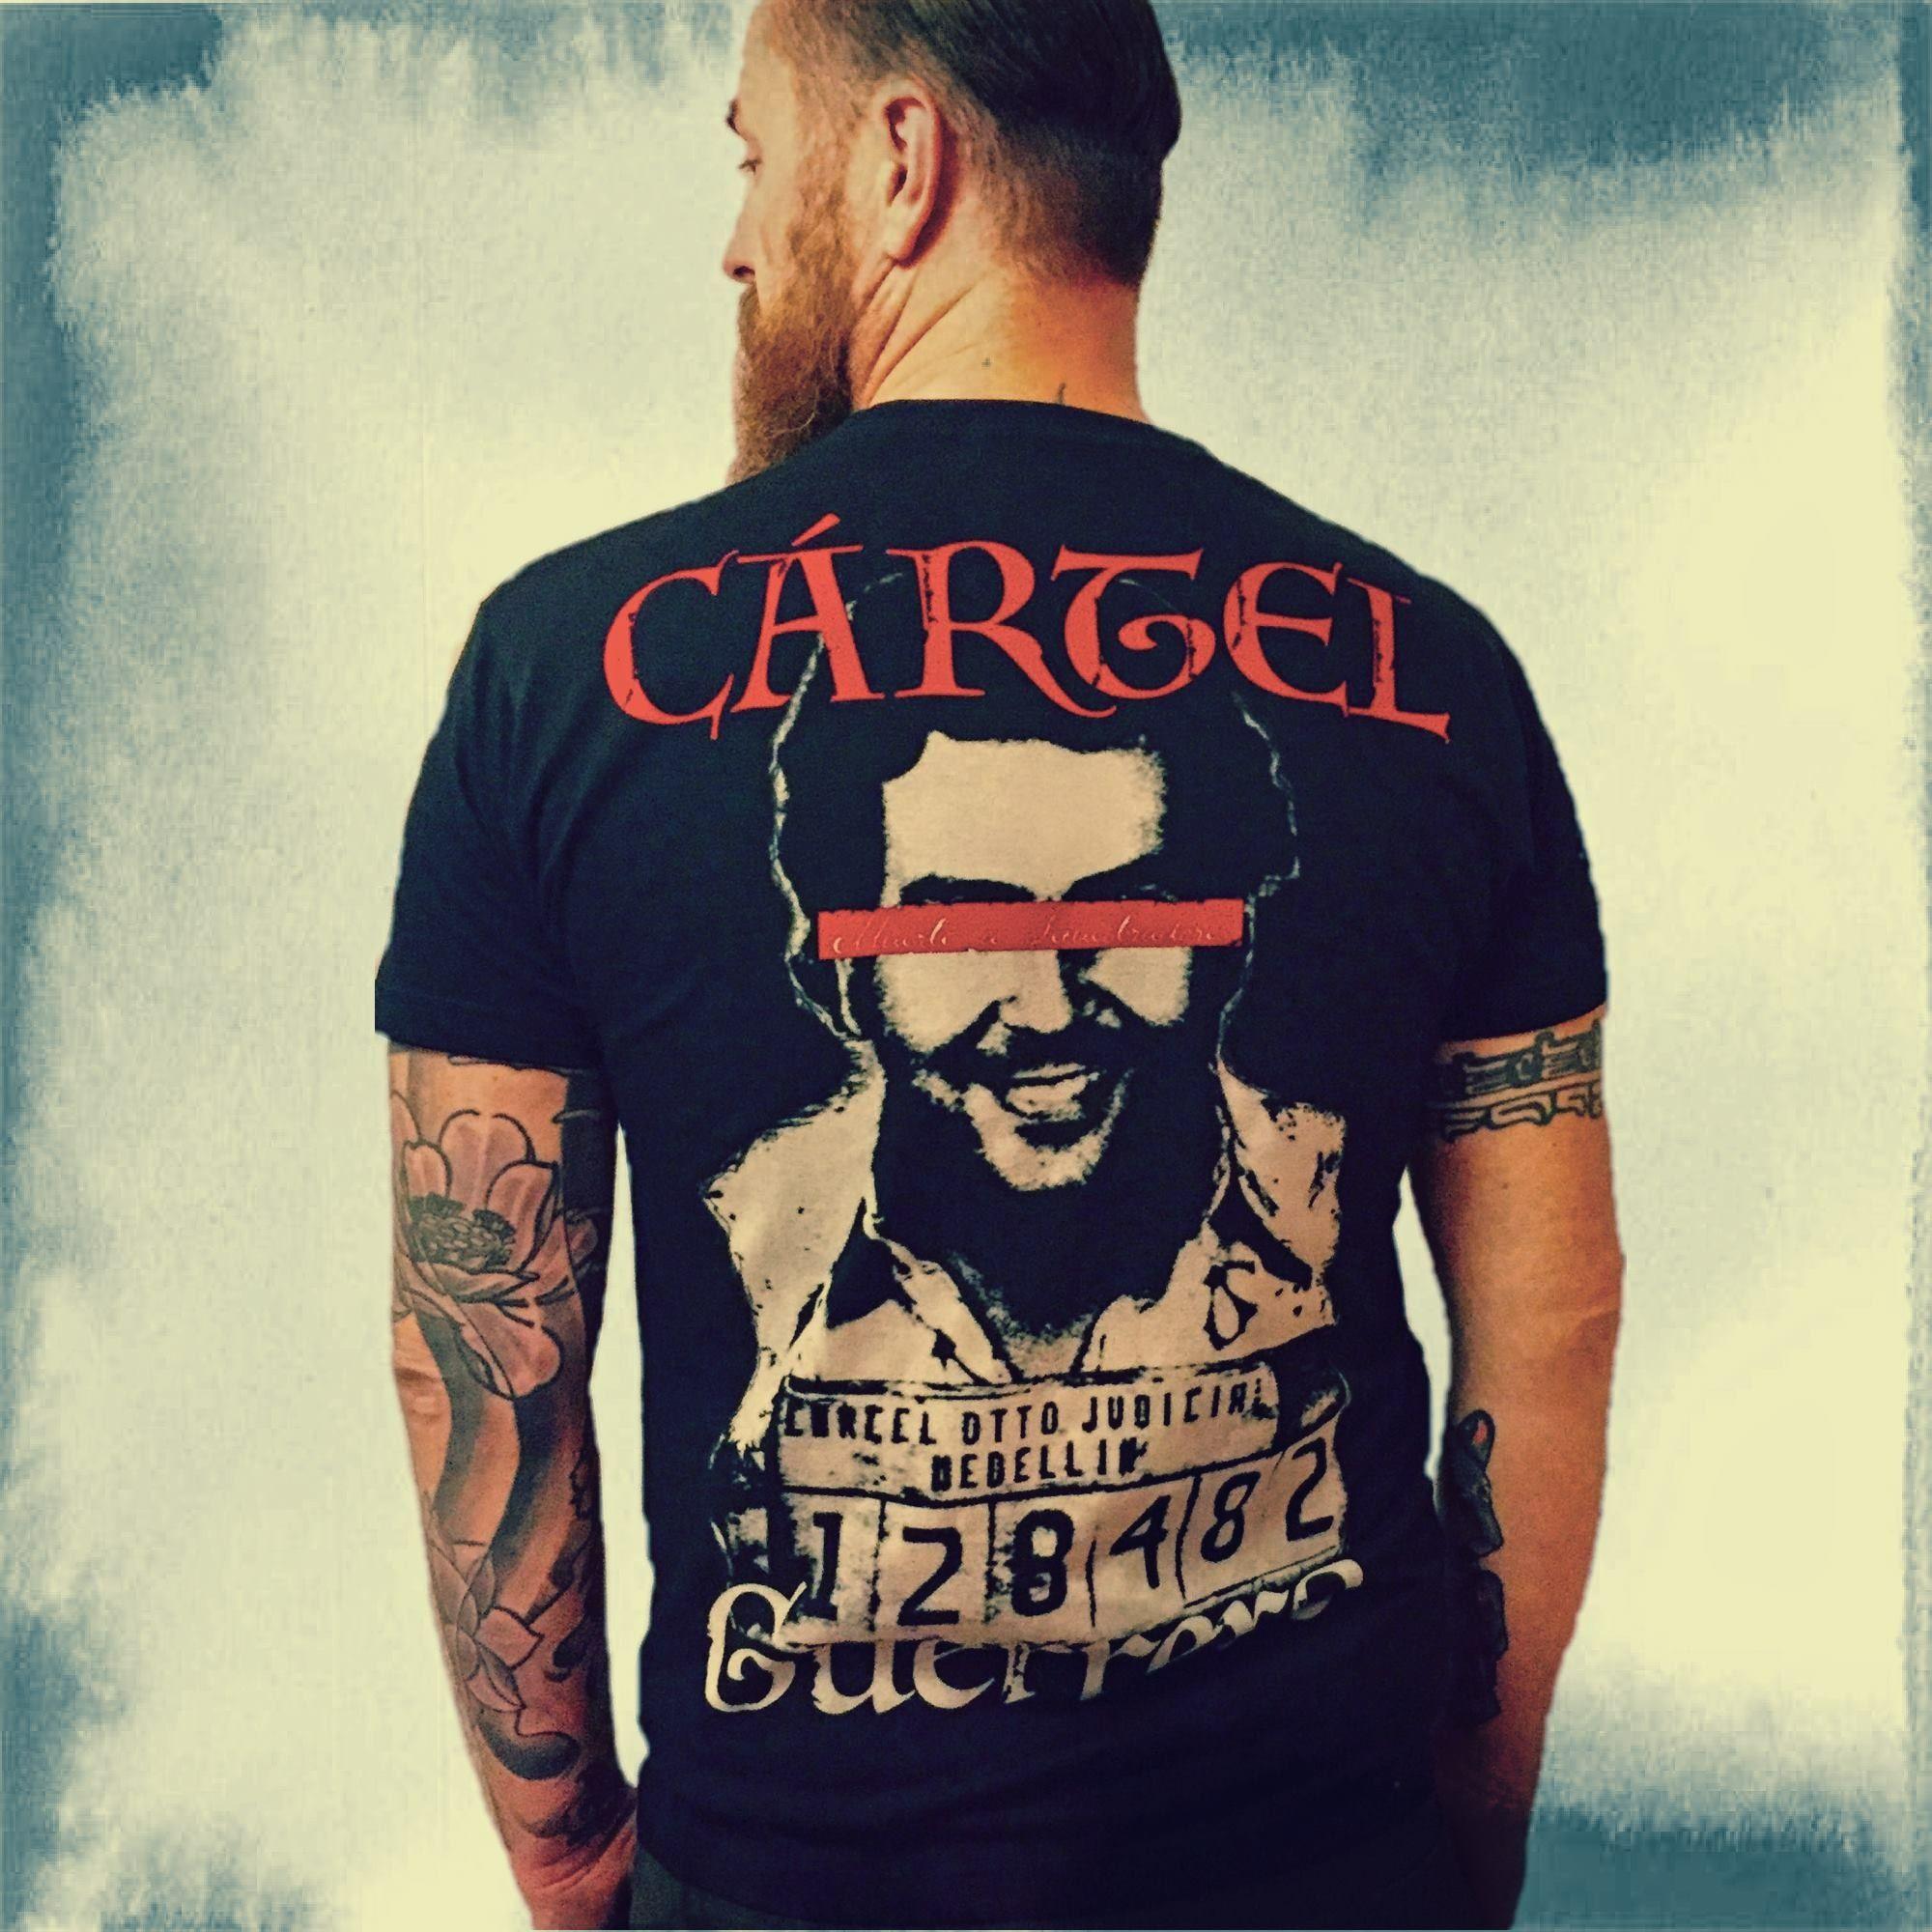 60c0be8f ☆CARTEL ORIGINAL- MEDELLIN Black☆ #carteloriginal #cartel #clothing #tattoo  #